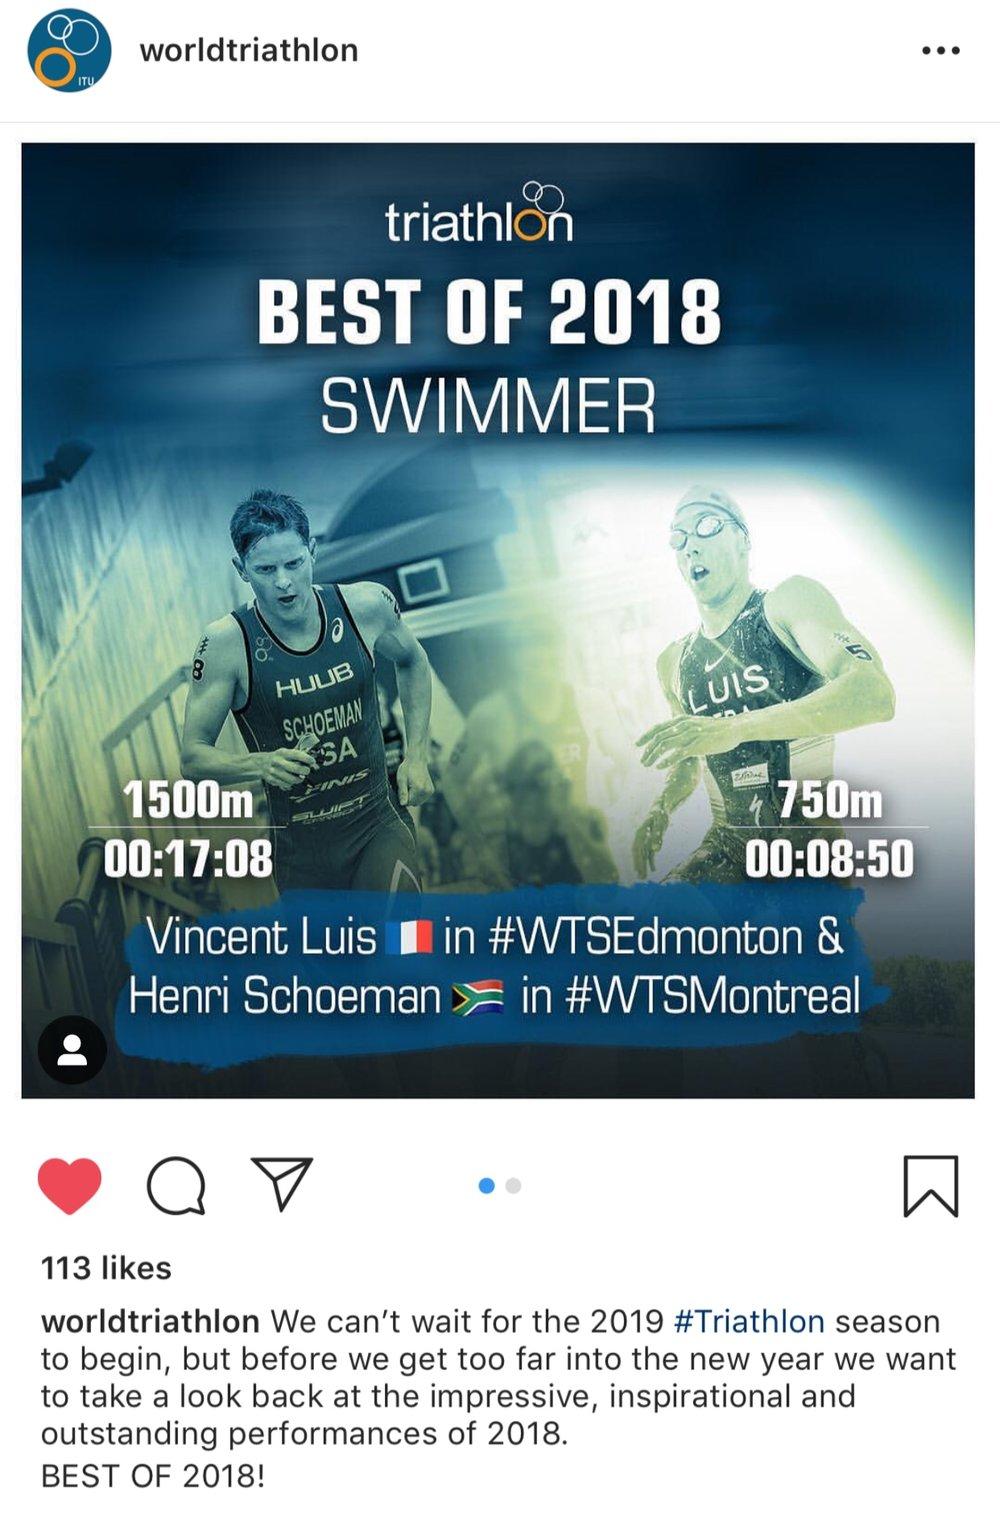 vincentluis_swimming2018.png